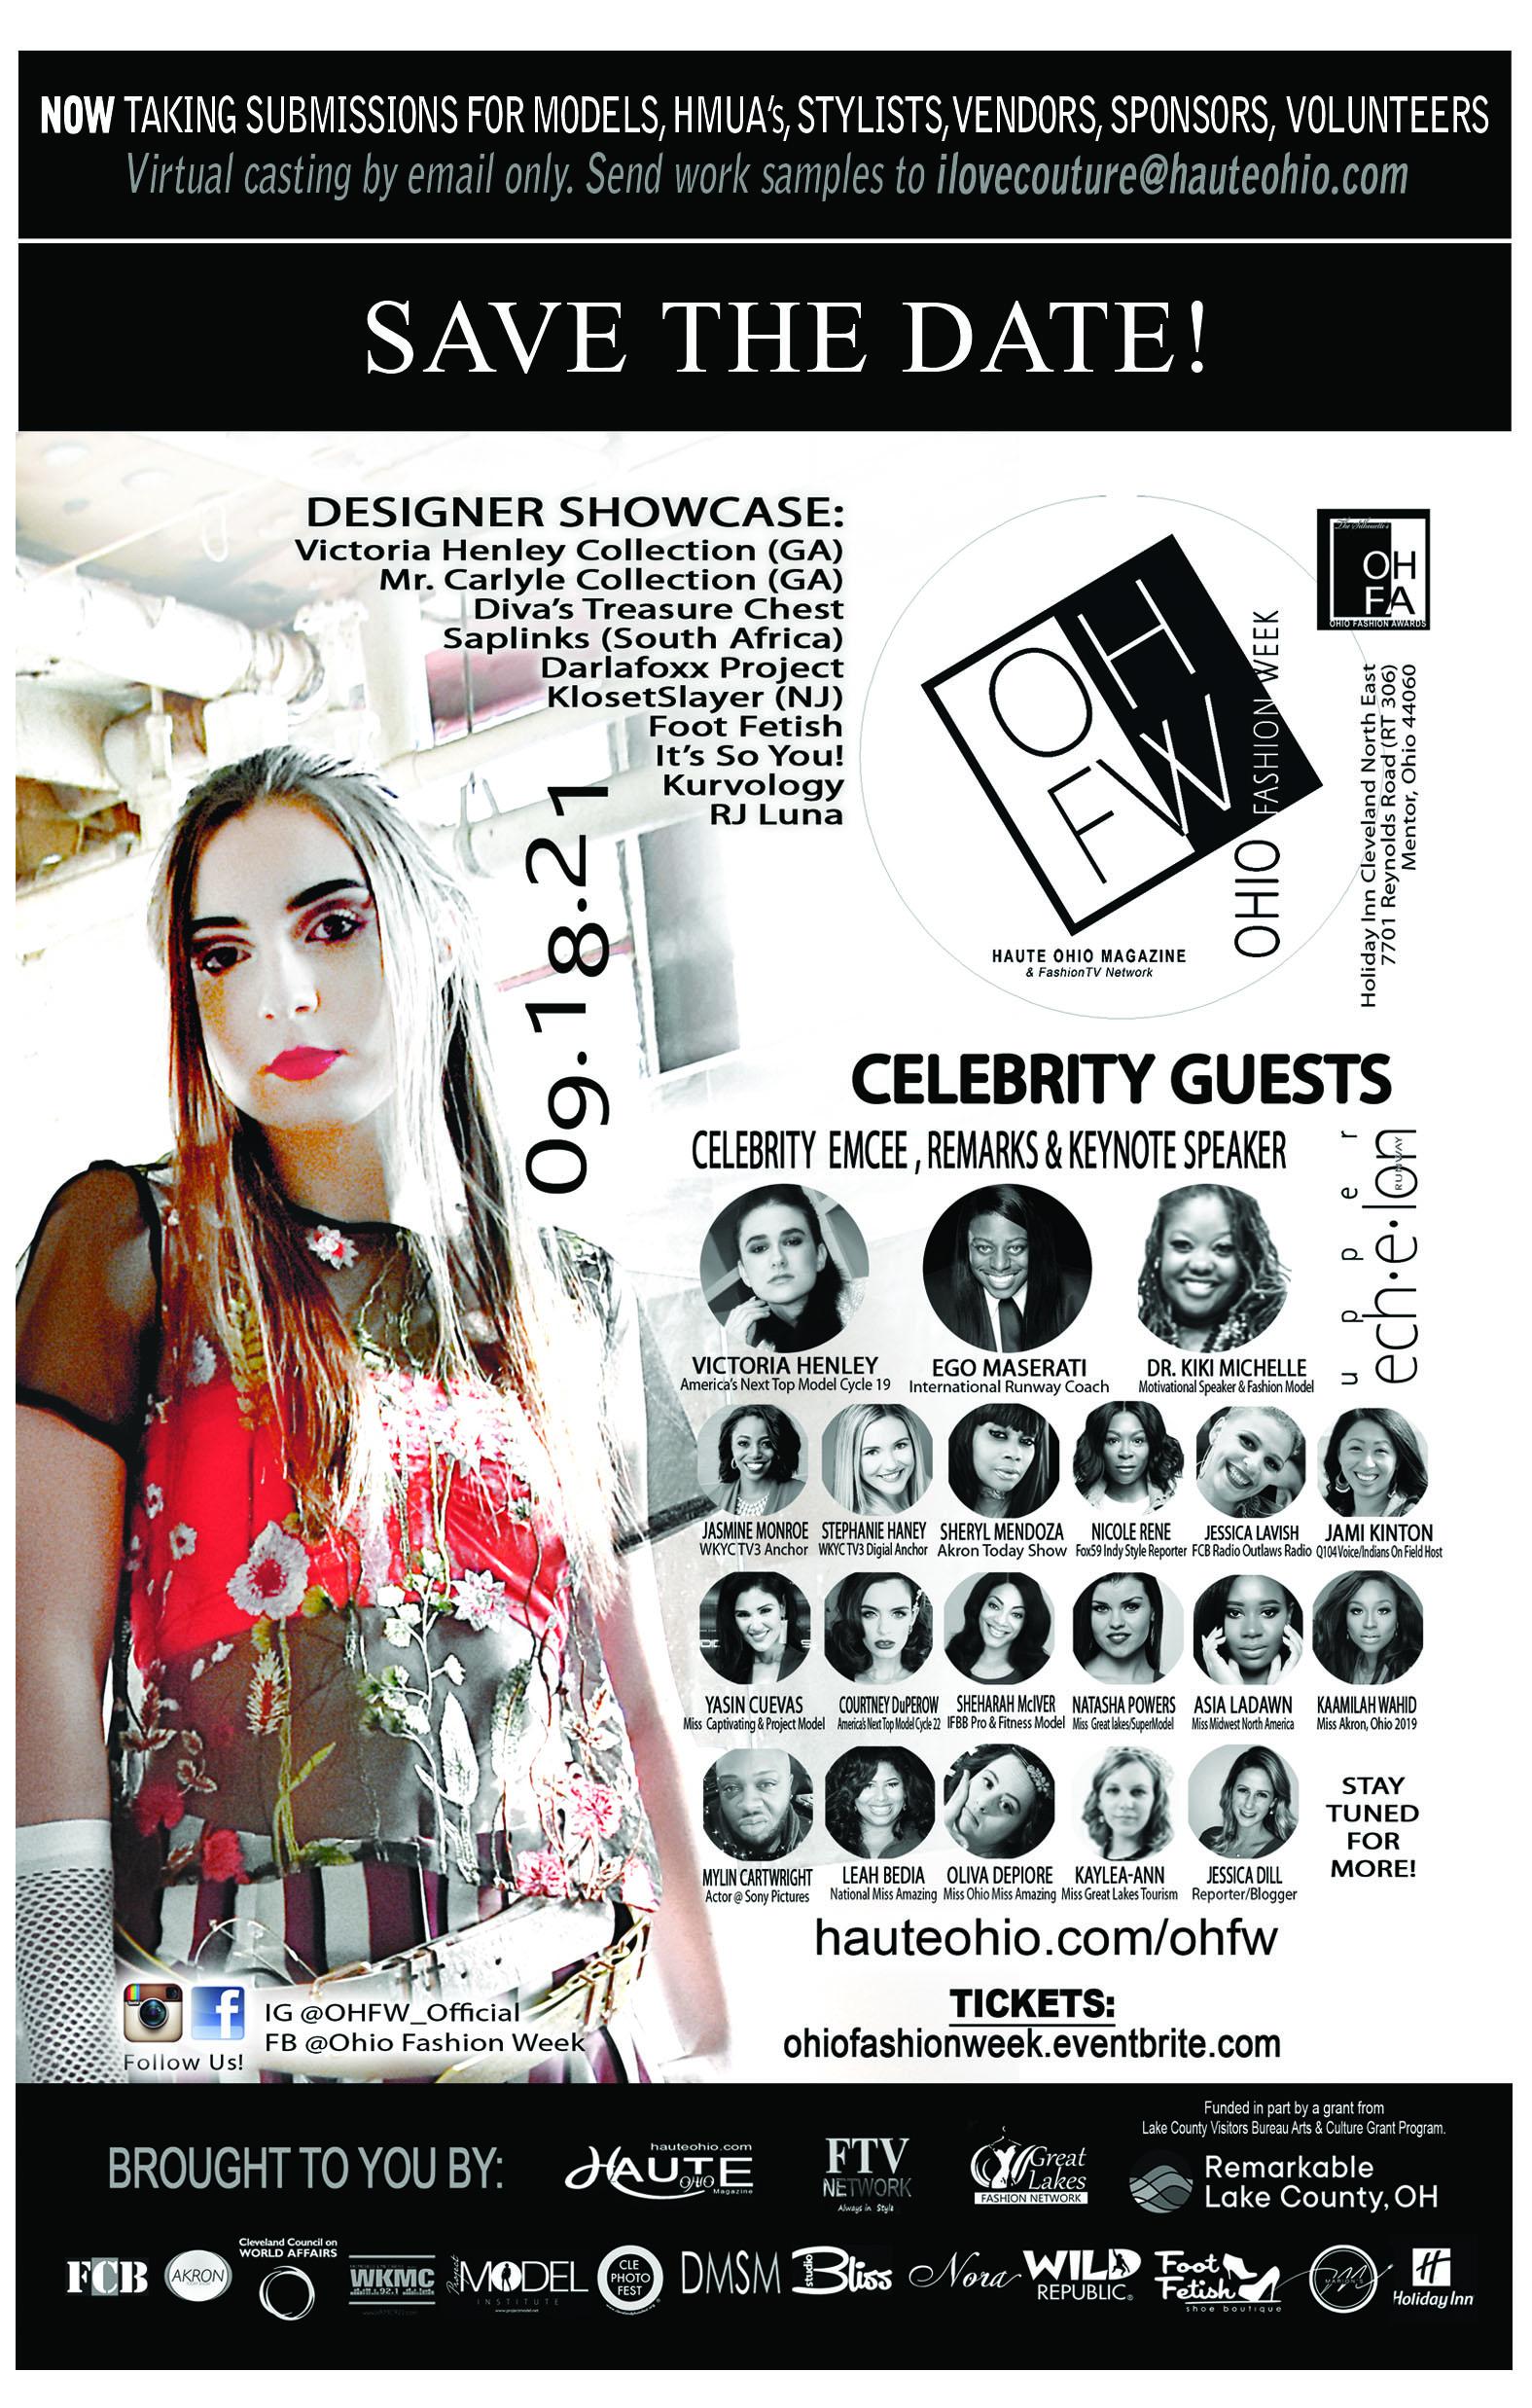 Haute Ohio Magazine - Ohio's Only Quarterly High Fashion Publication